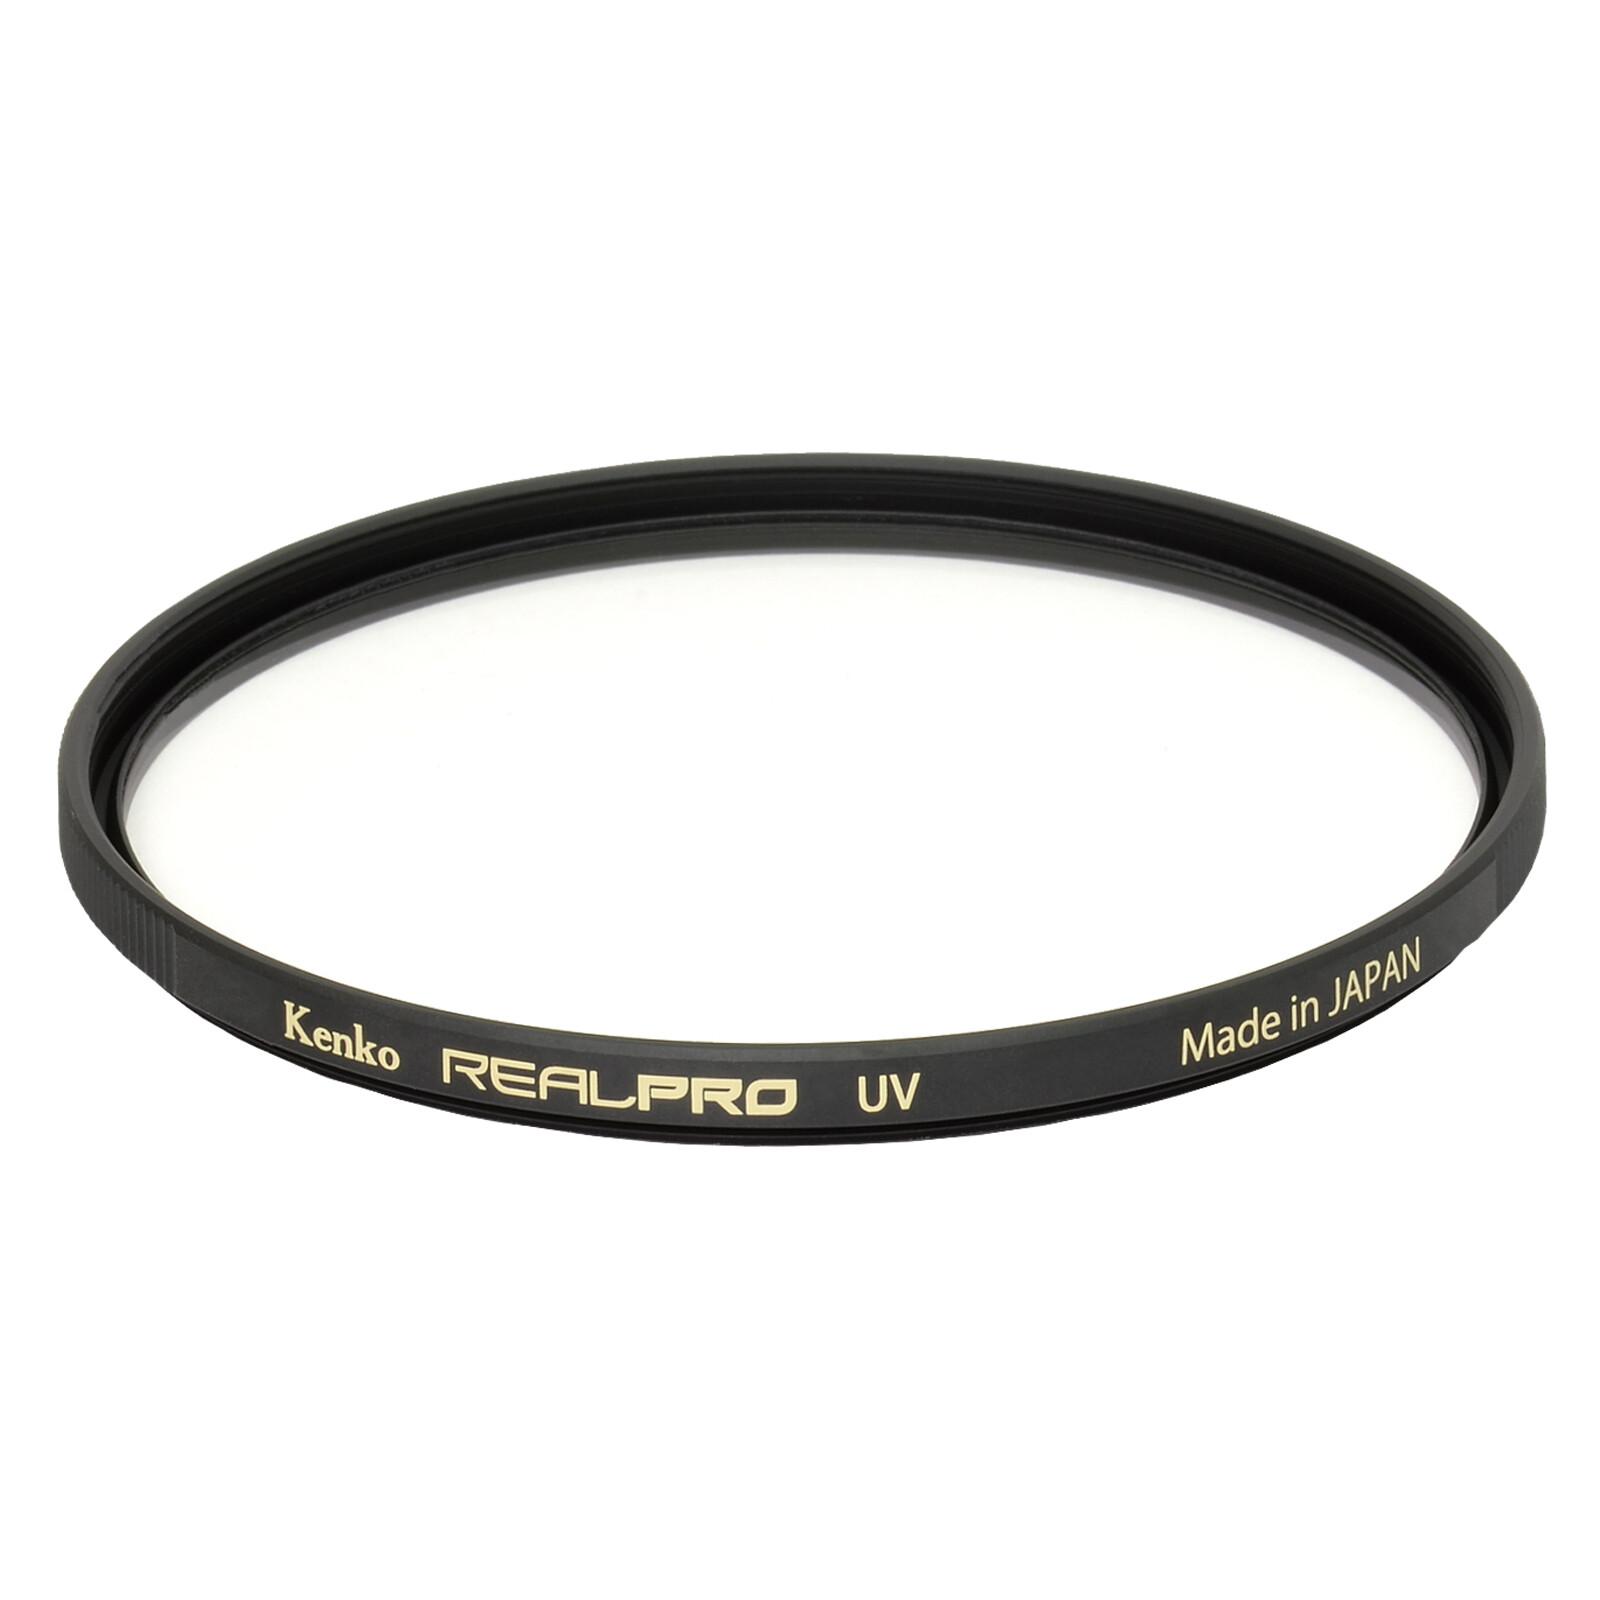 Kenko Real Pro UV 43mm Slim